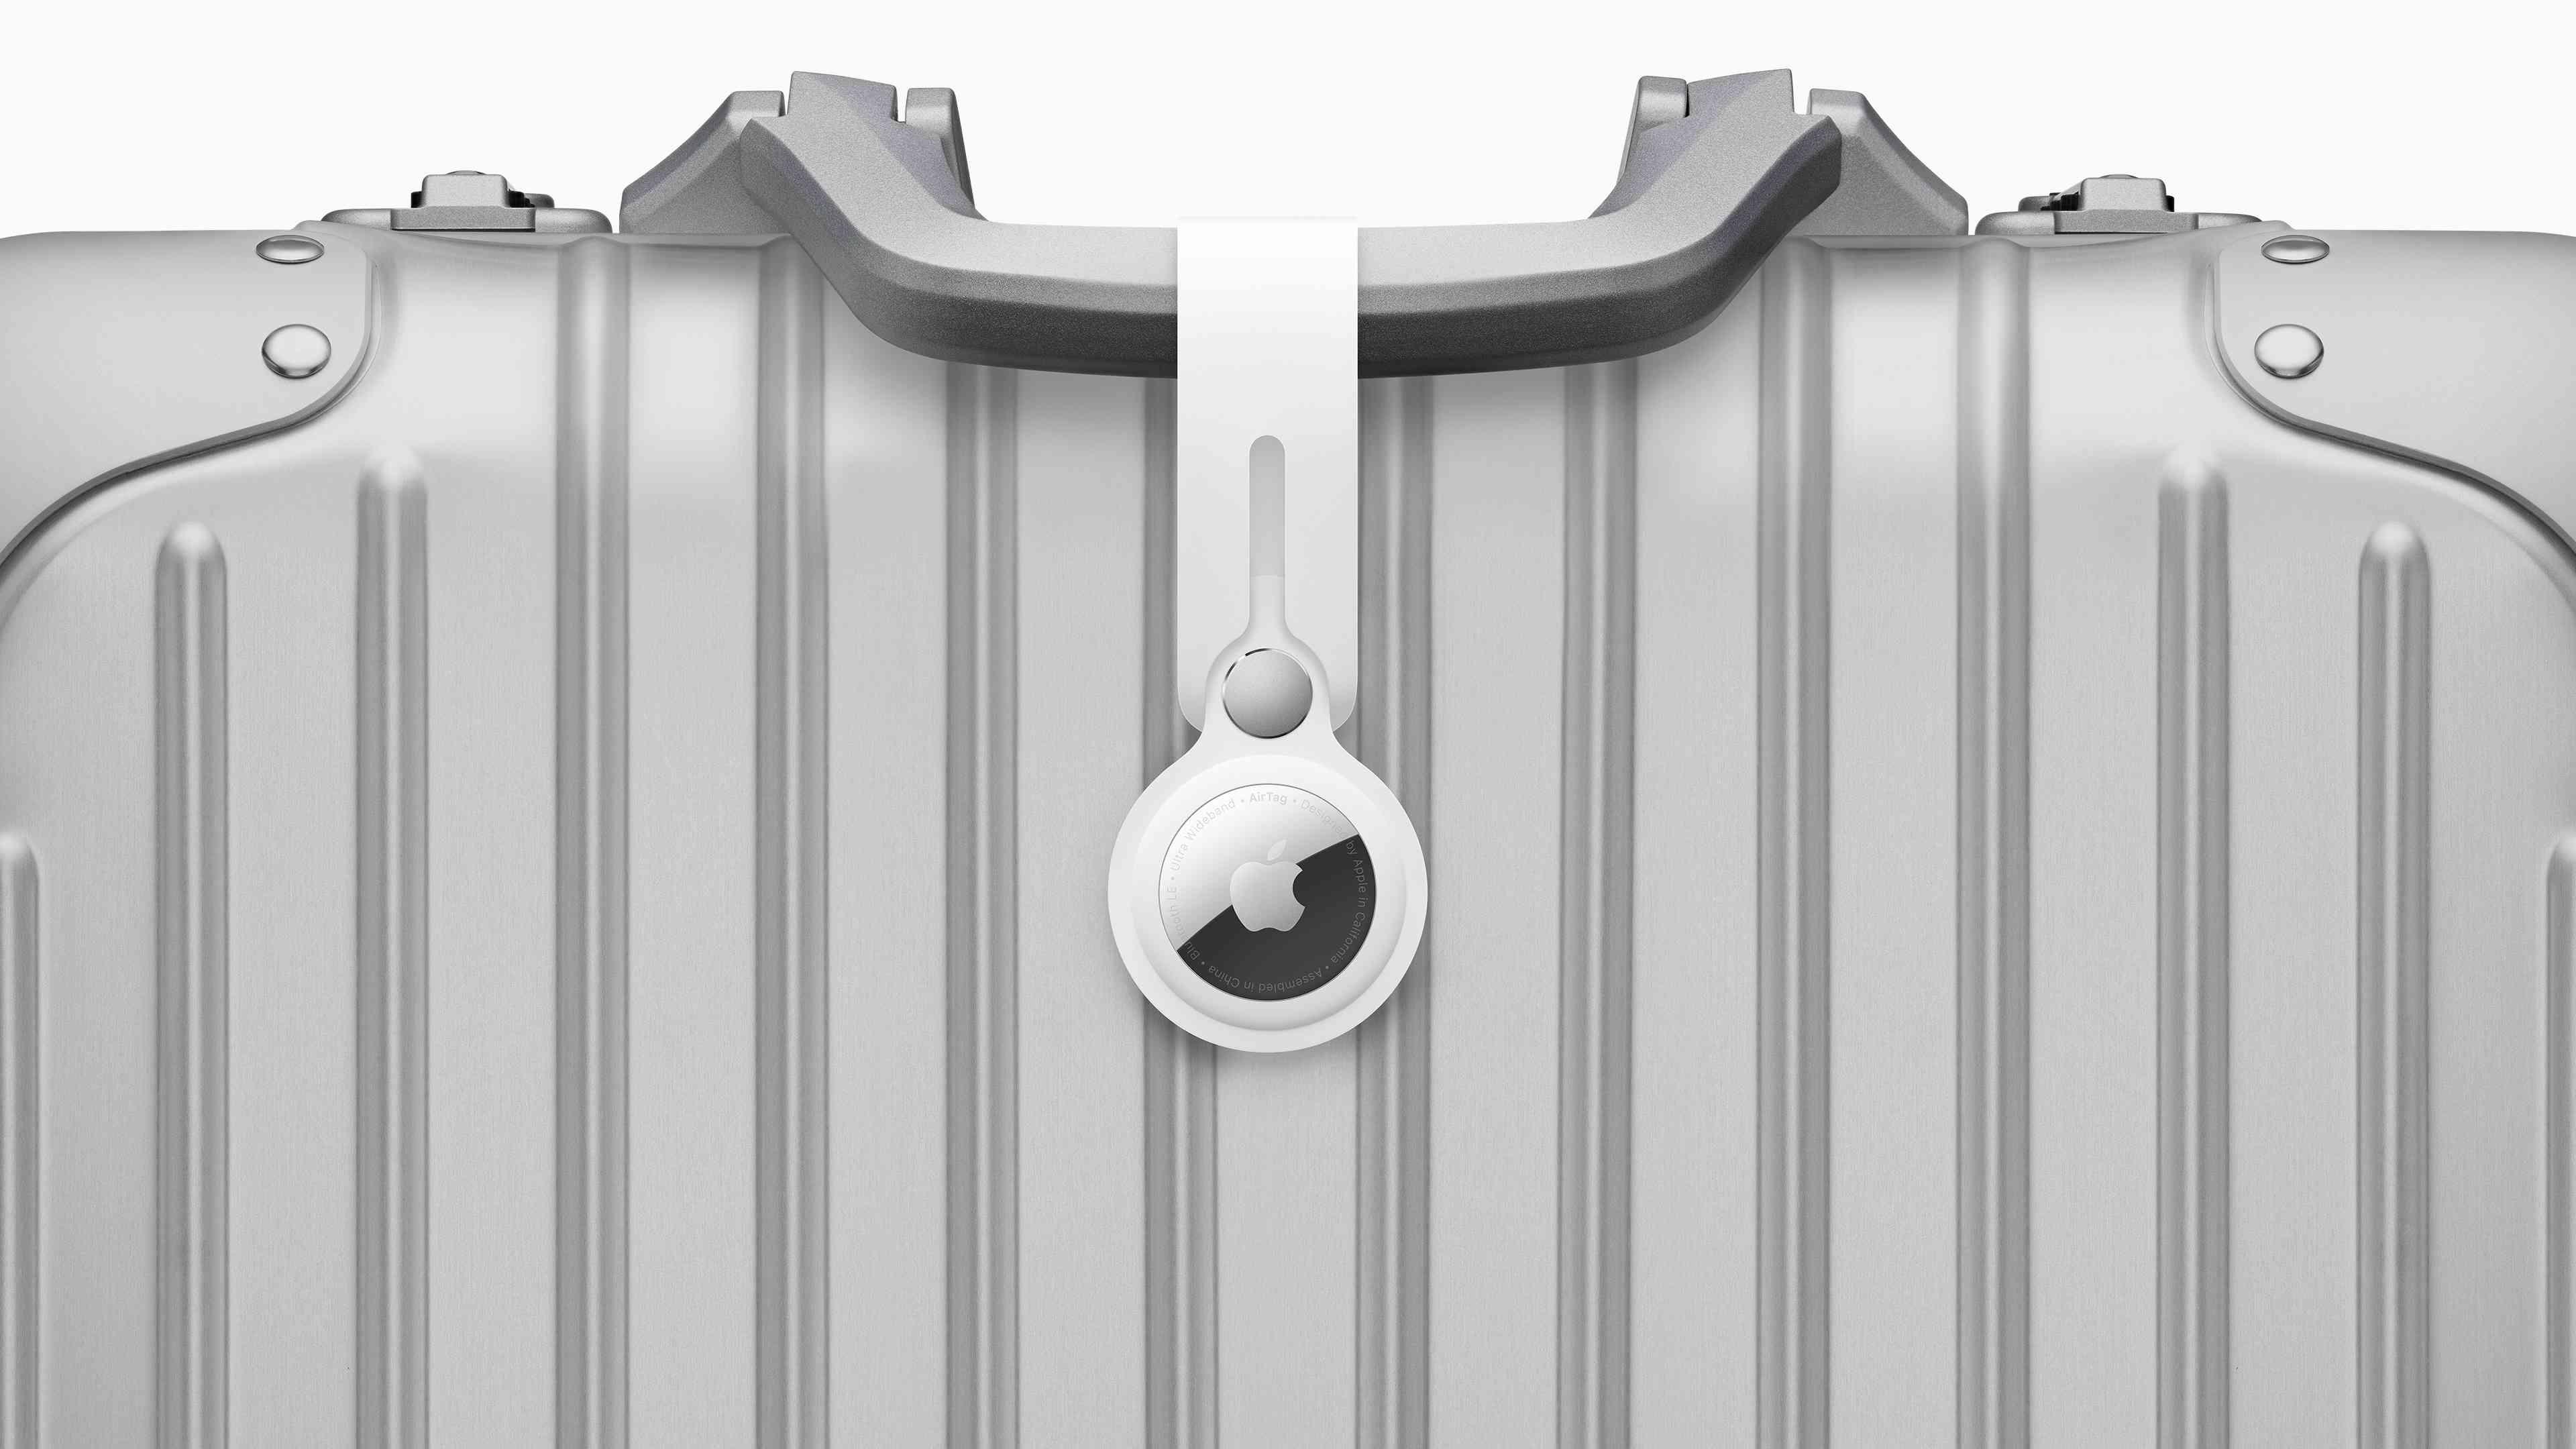 An Apple AirTag on a suitcase handle.